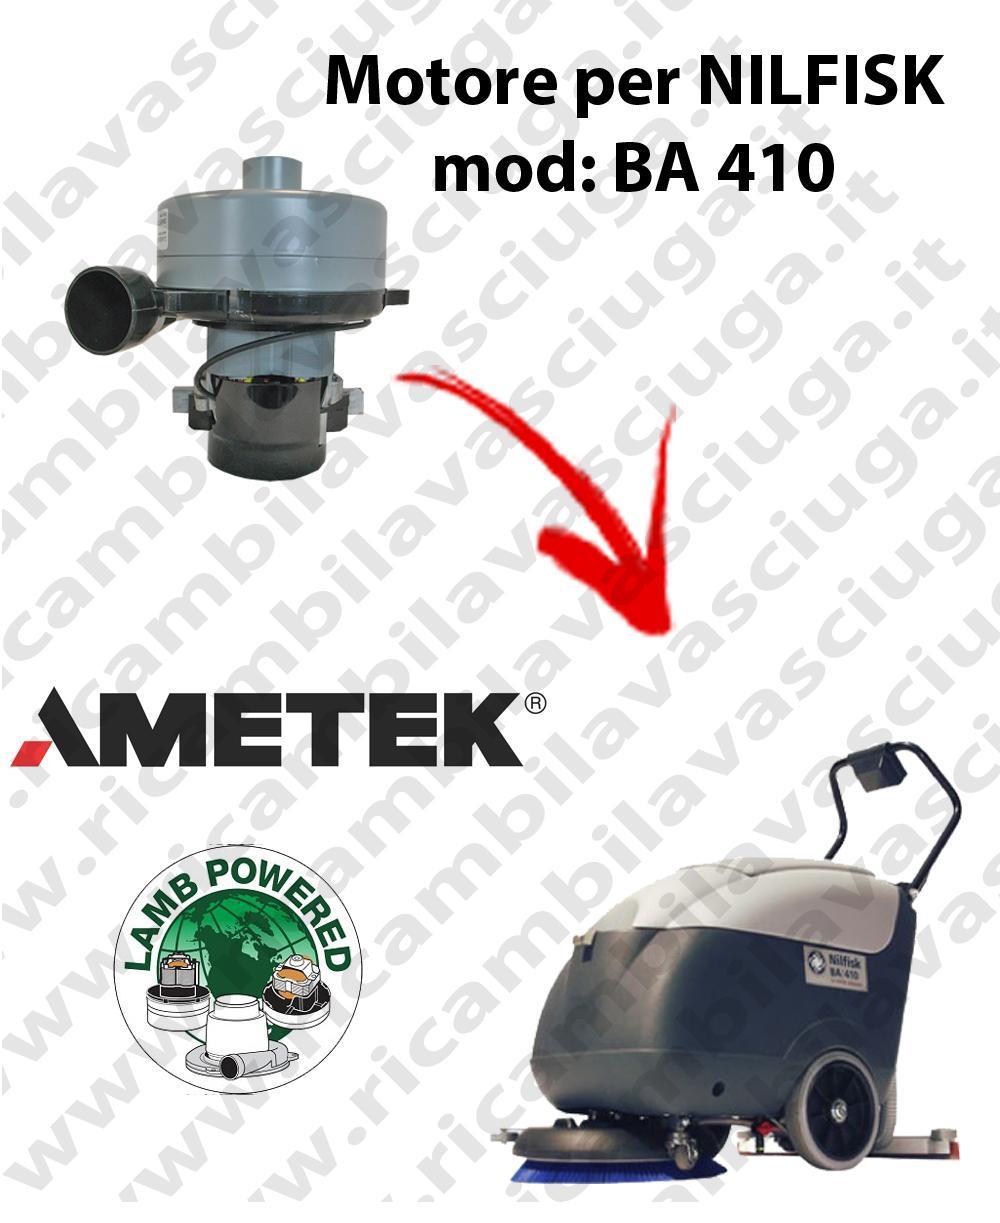 BA 410 Saugmotor LAMB AMETEK für scheuersaugmaschinen NILFISK